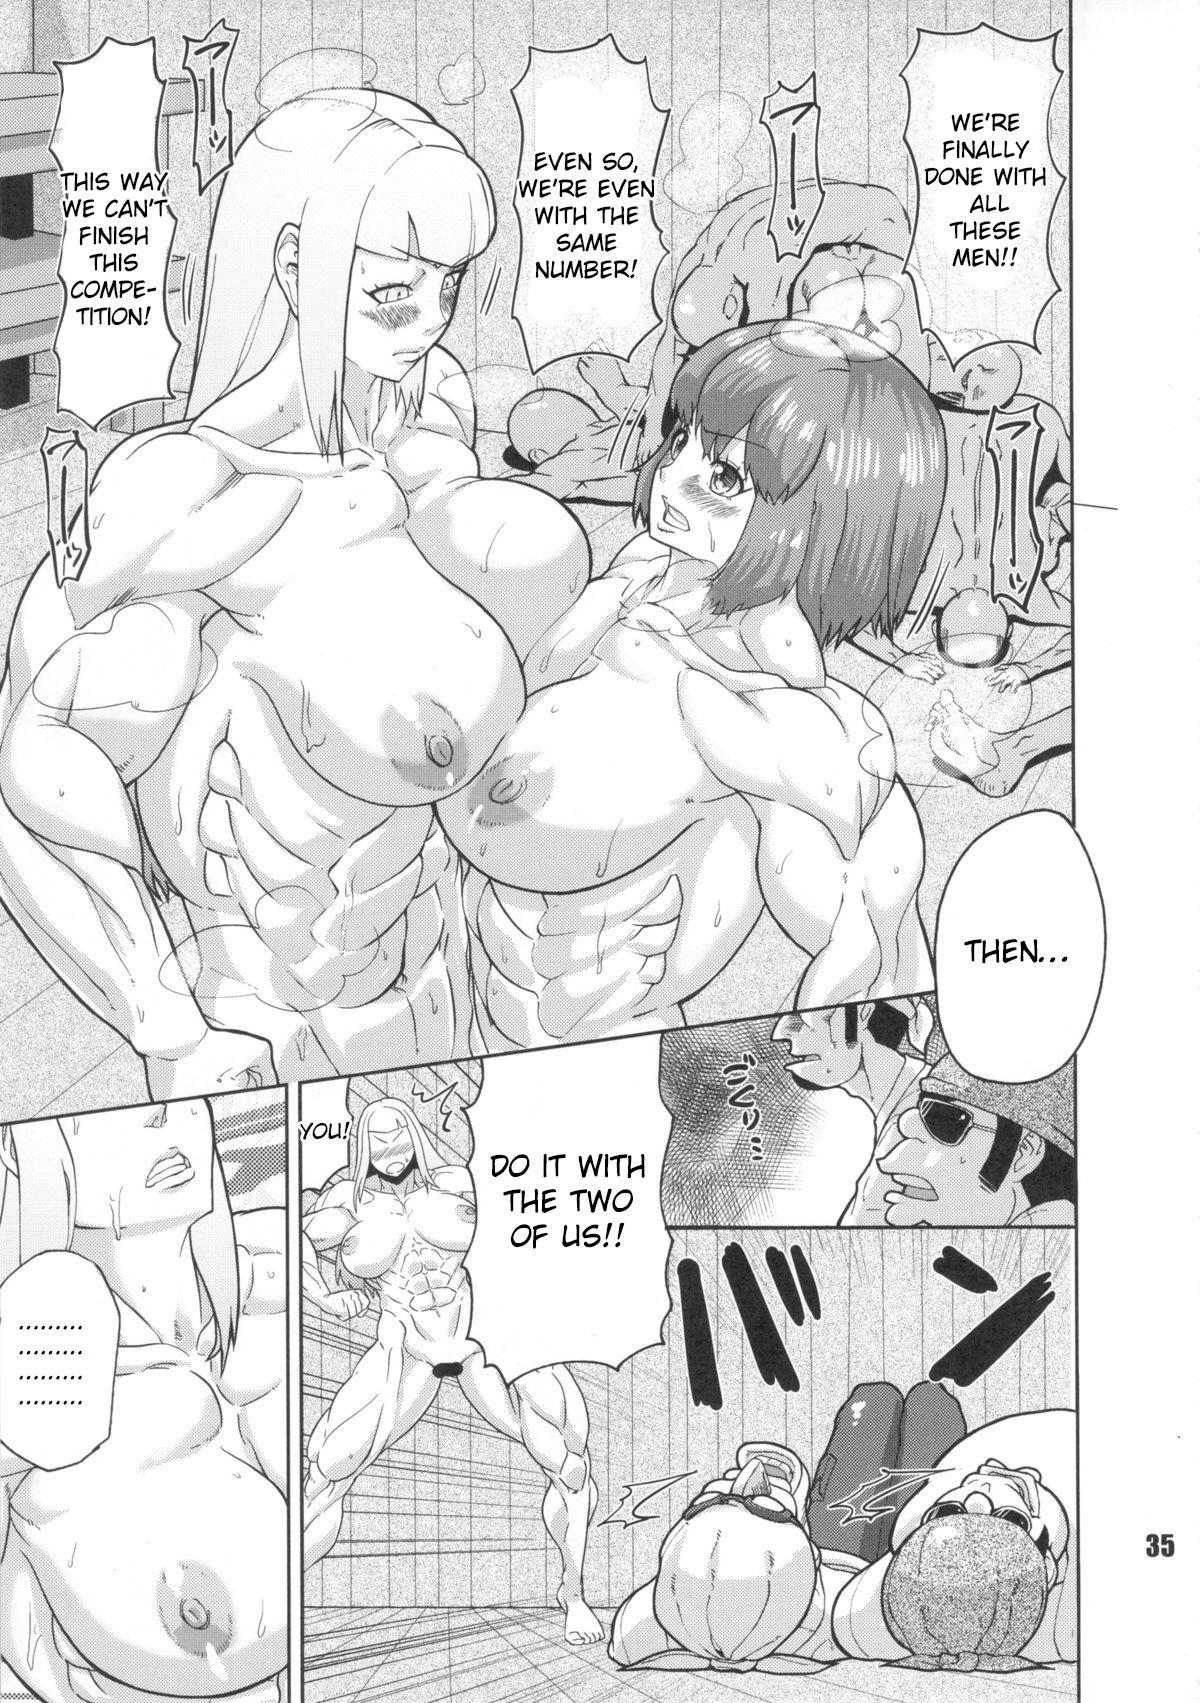 Magic Muscle Girl Six Pack / Jackasss (nWa 7th in Light Heavyweight) ENG (NEO-QUEENDOM Vol. 8) [Raknnkarscans] 6